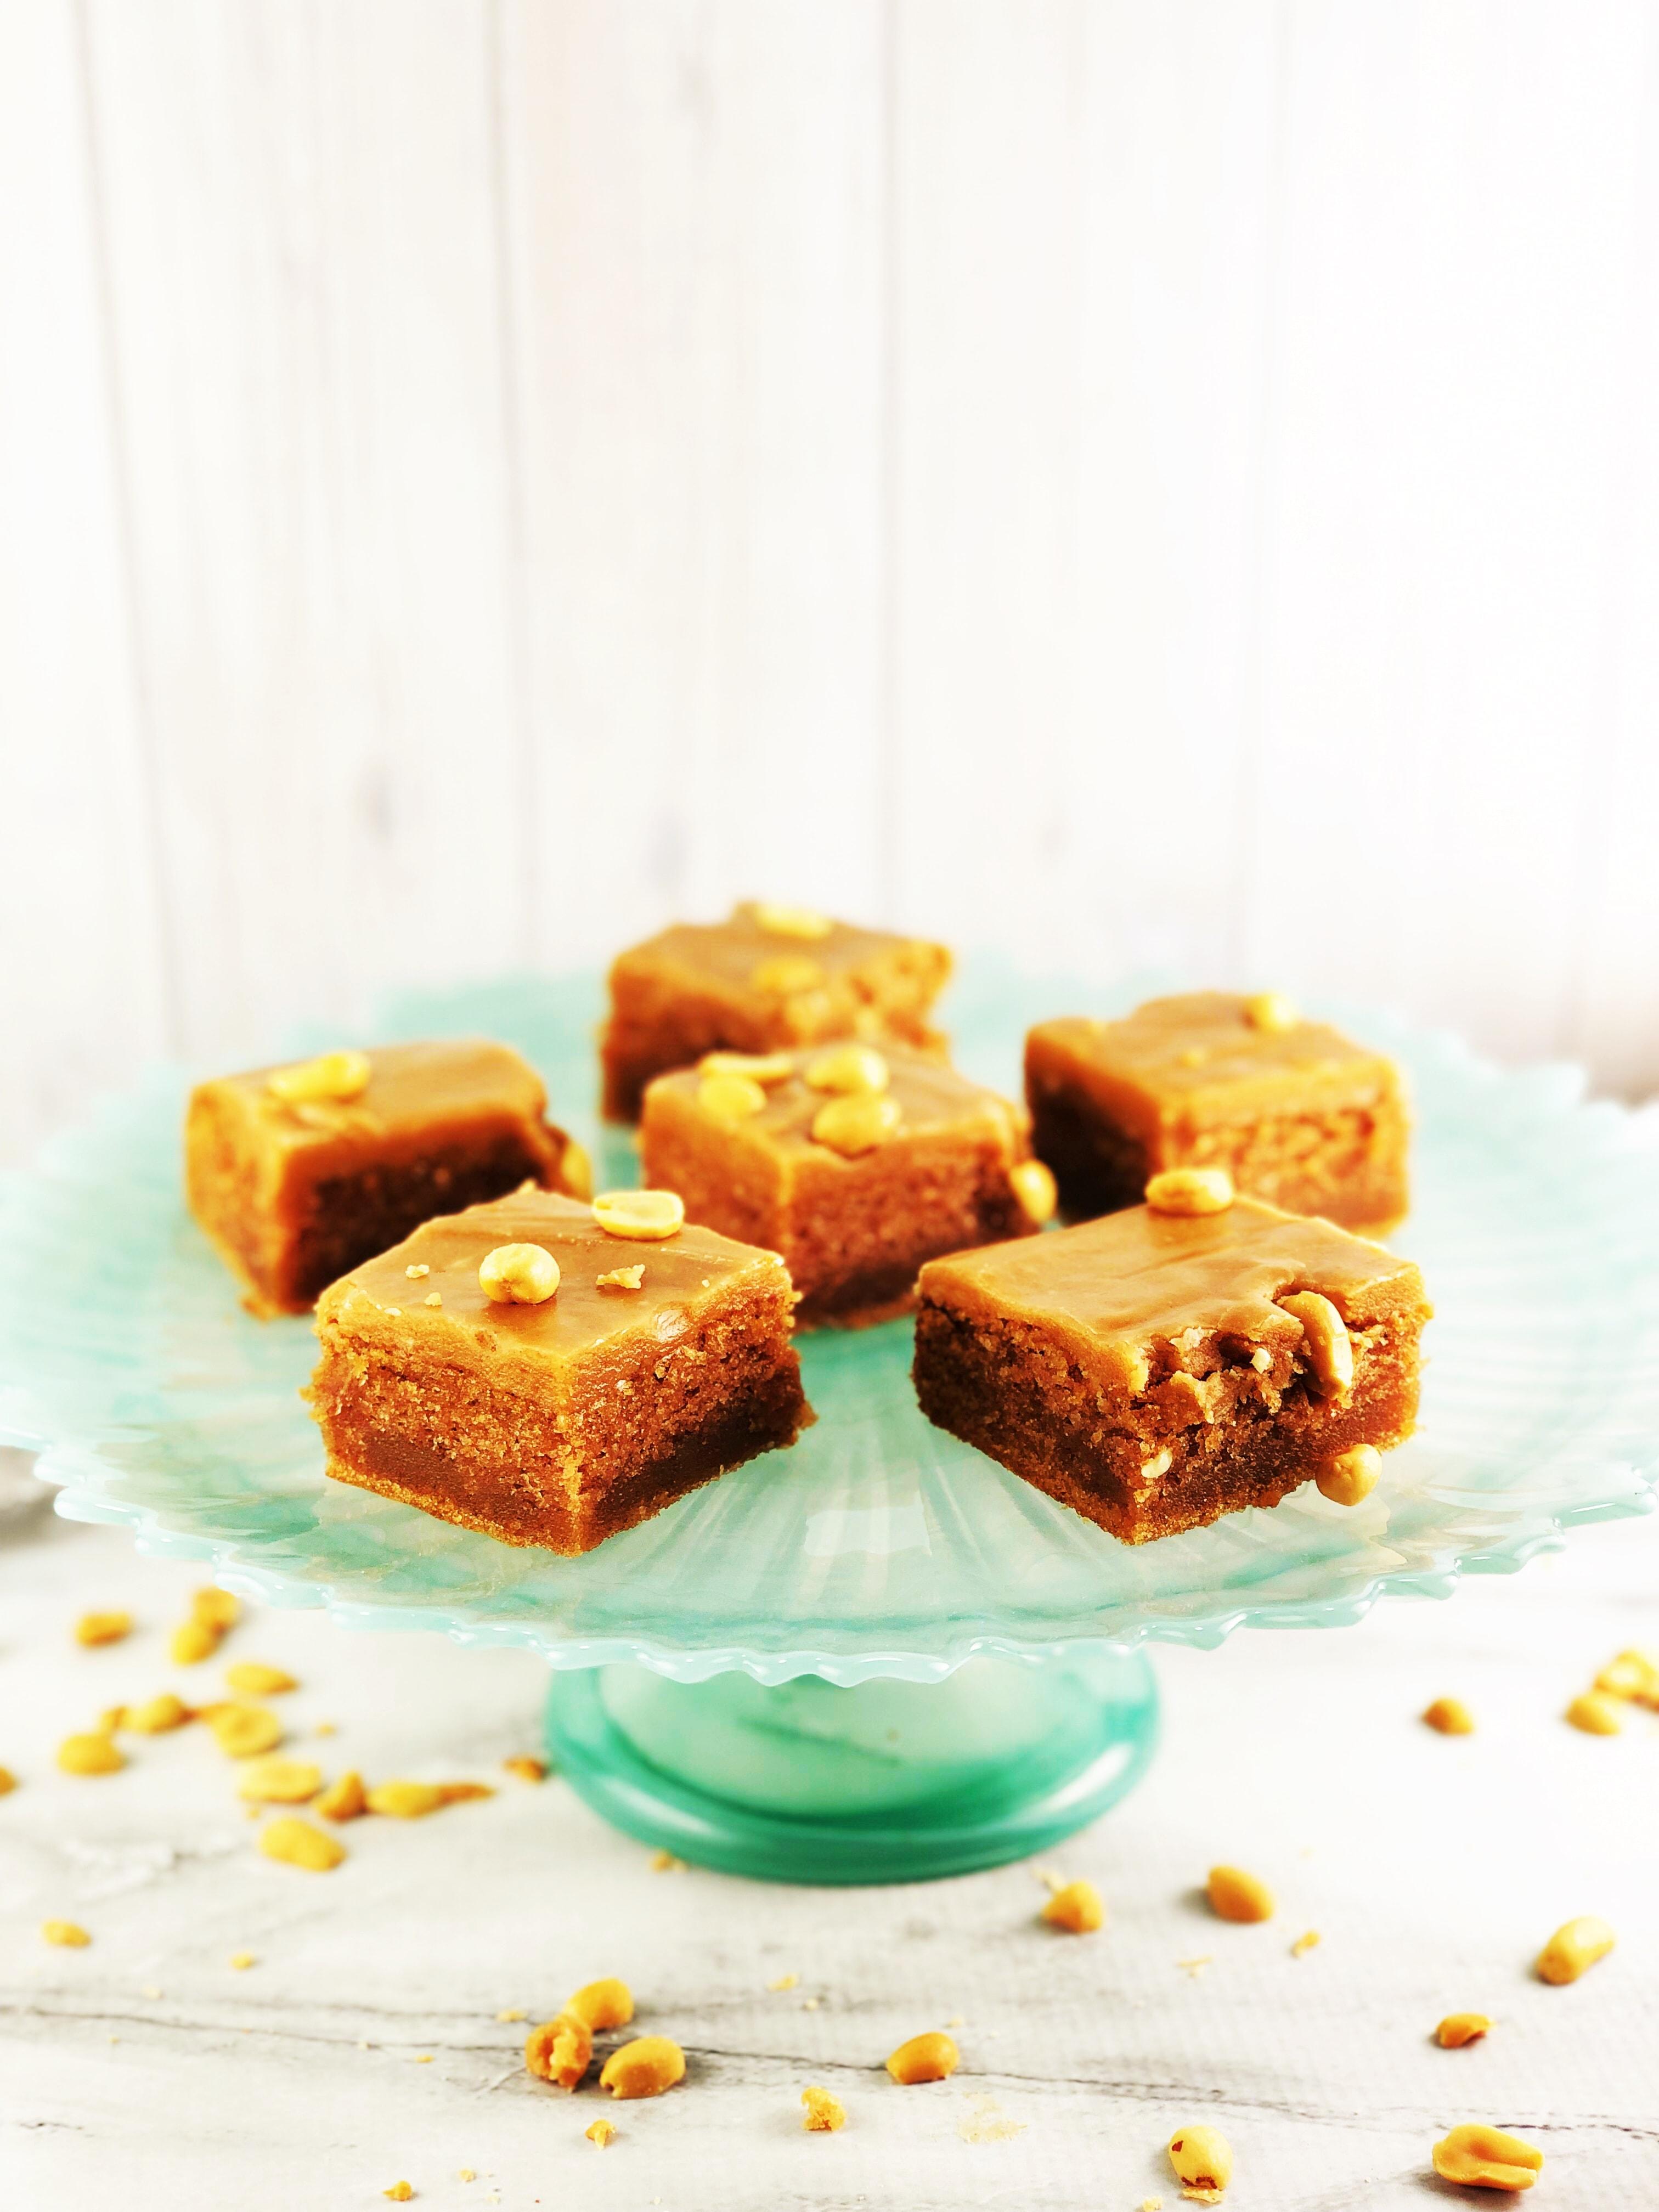 Peanut Butter Cake Slices